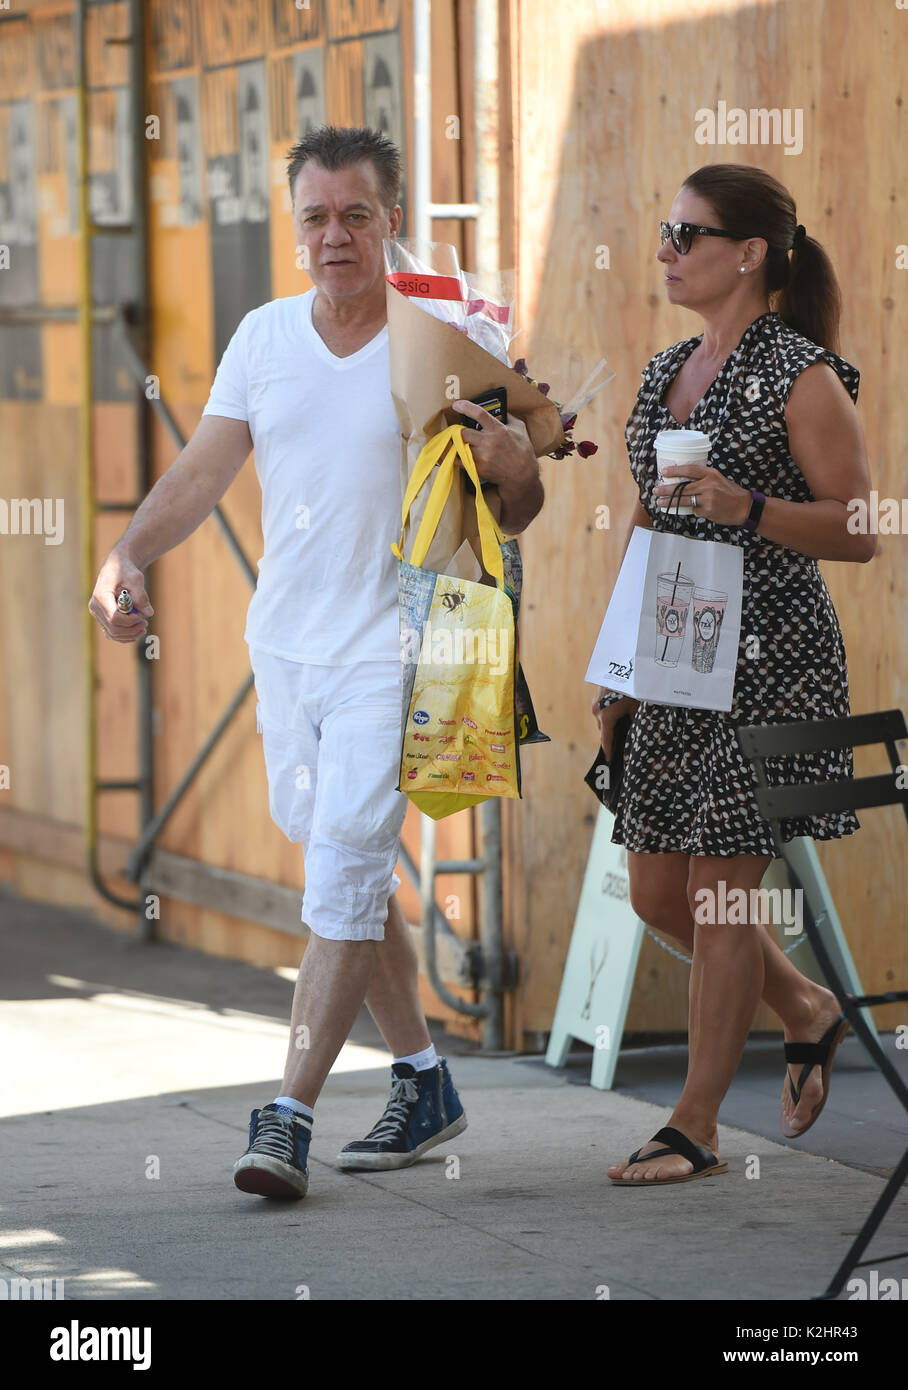 Eddie Van Halen Goes To The Farmers Market With His Wife Janie Stock Photo Alamy